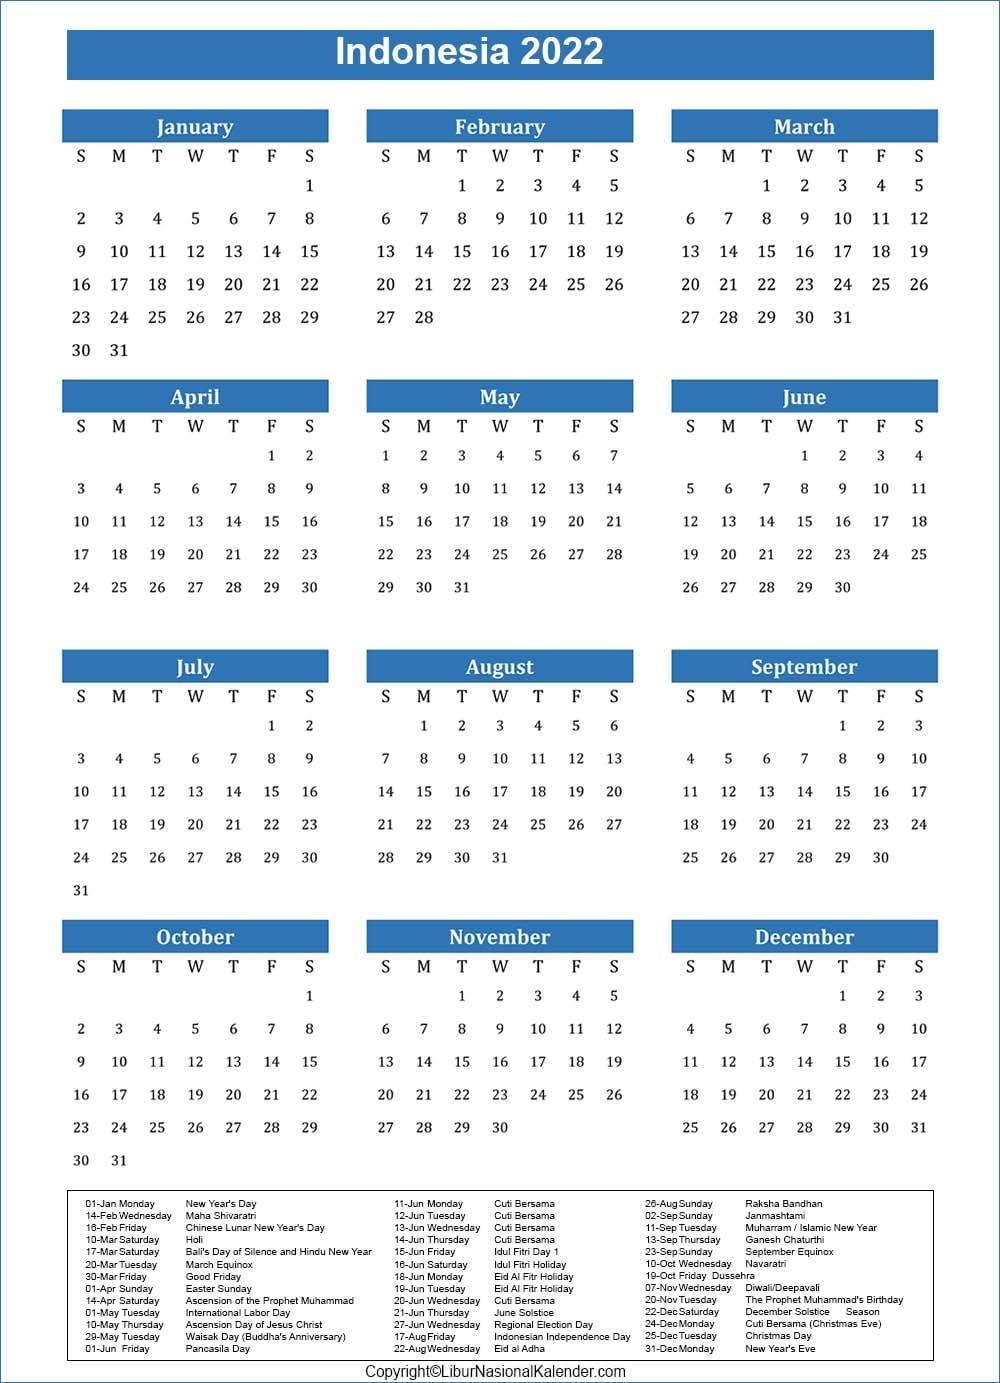 February Calendar 2022 - February 2022 Calendar With